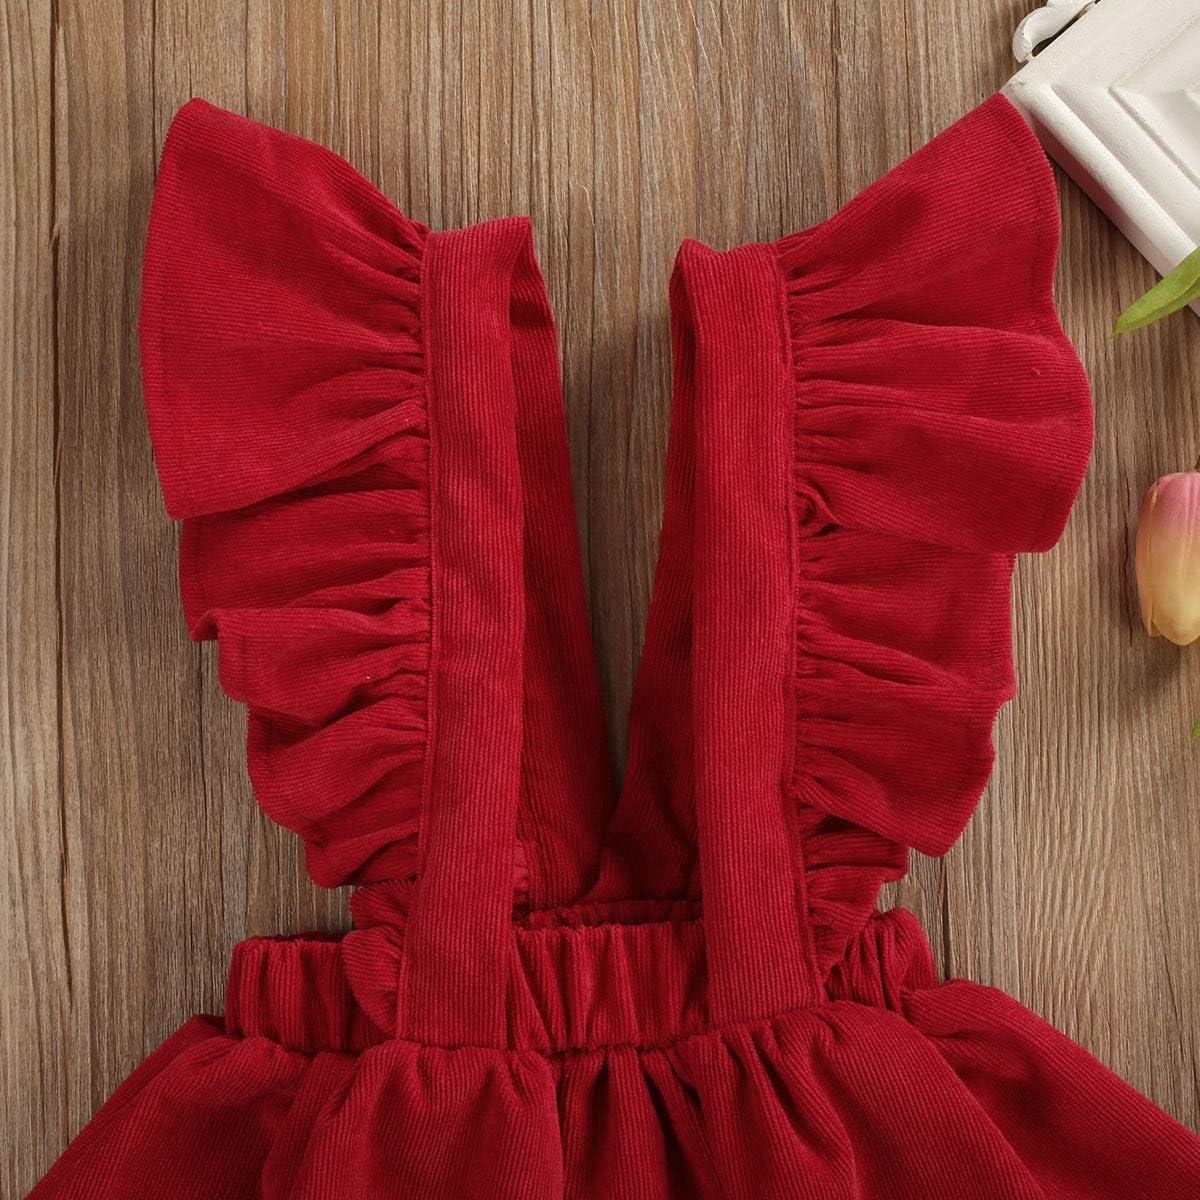 6M-5T BERTY Baby Girl Tutu Dress Suspender Skirt Sleeveless Backless Ruffle Skirt